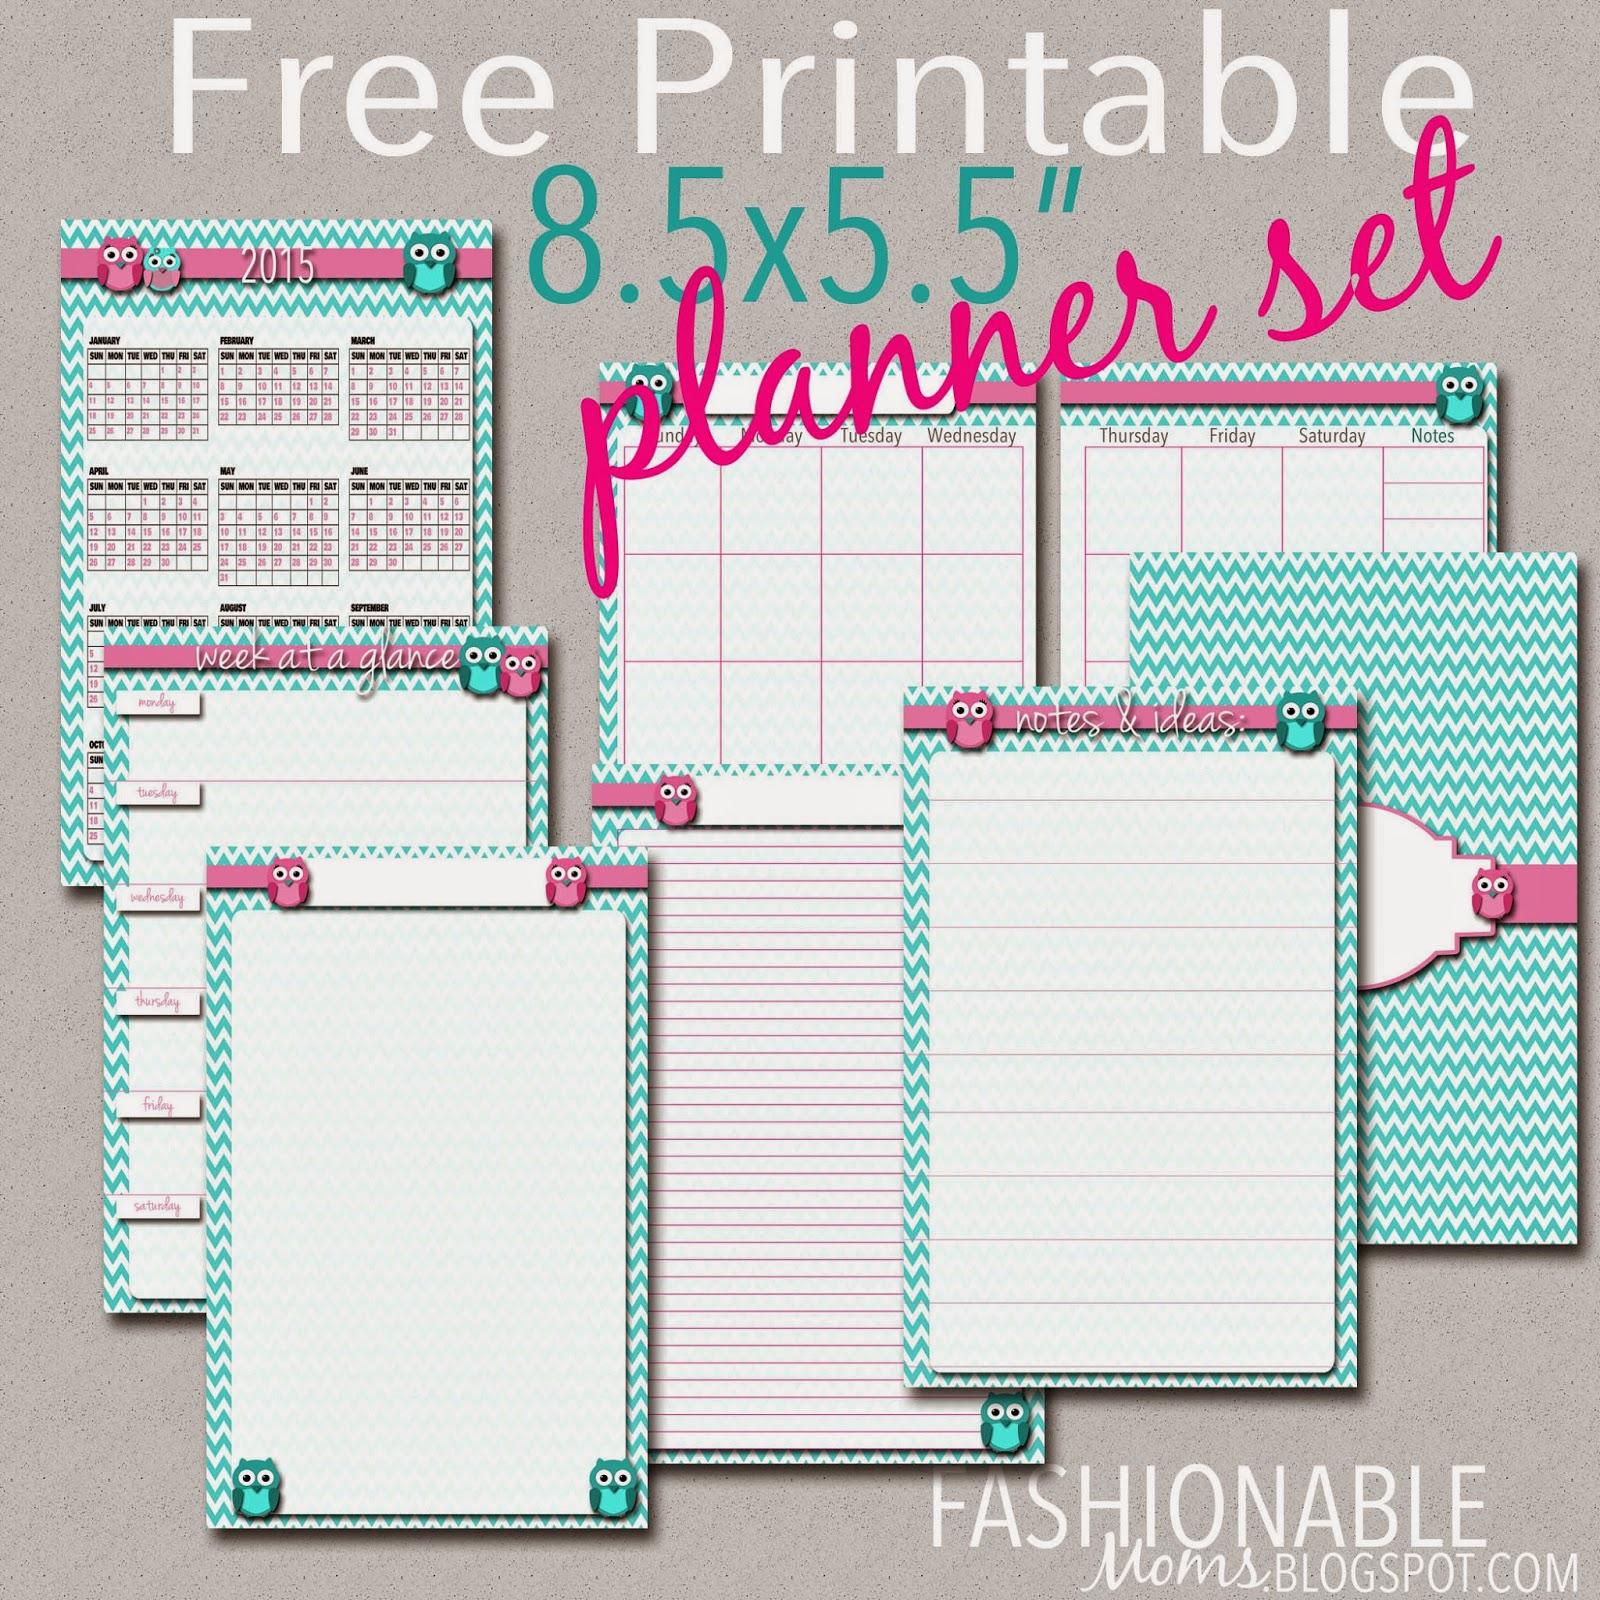 Fashionable Moms Free Printable Half Page Owl Planner Set